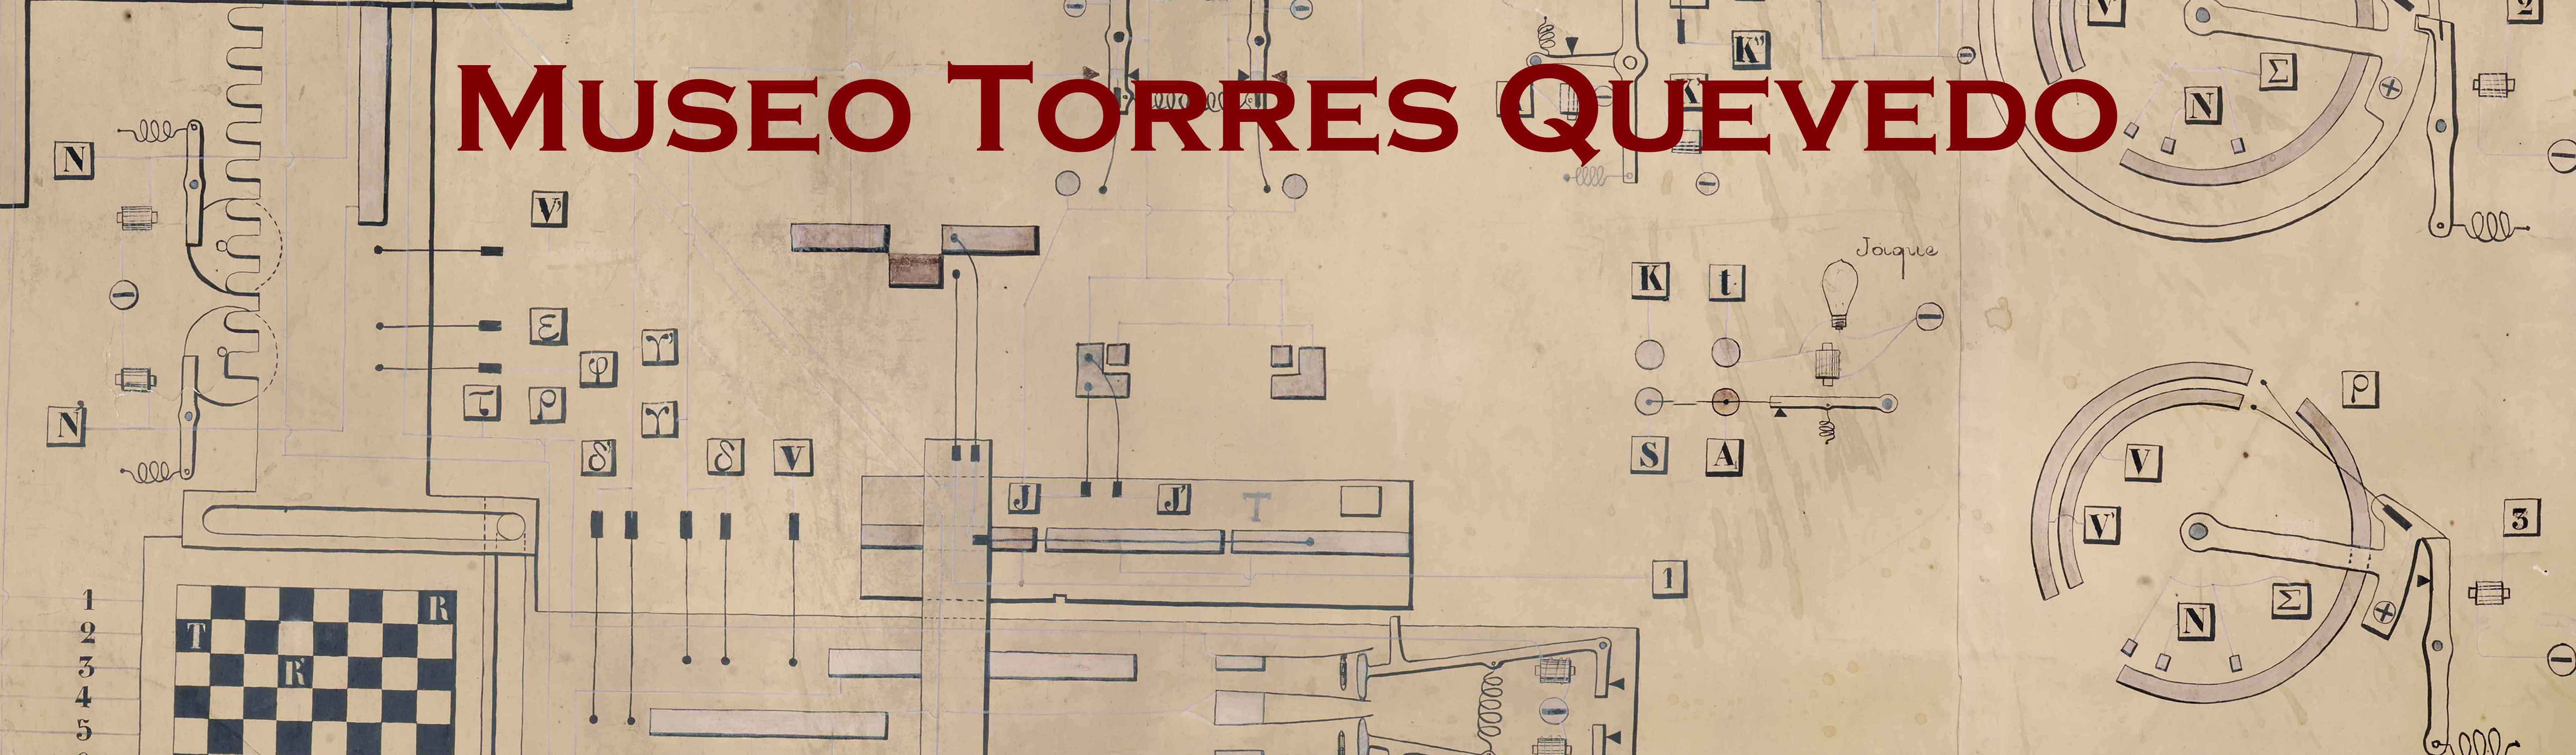 Museo Torres Quevedo